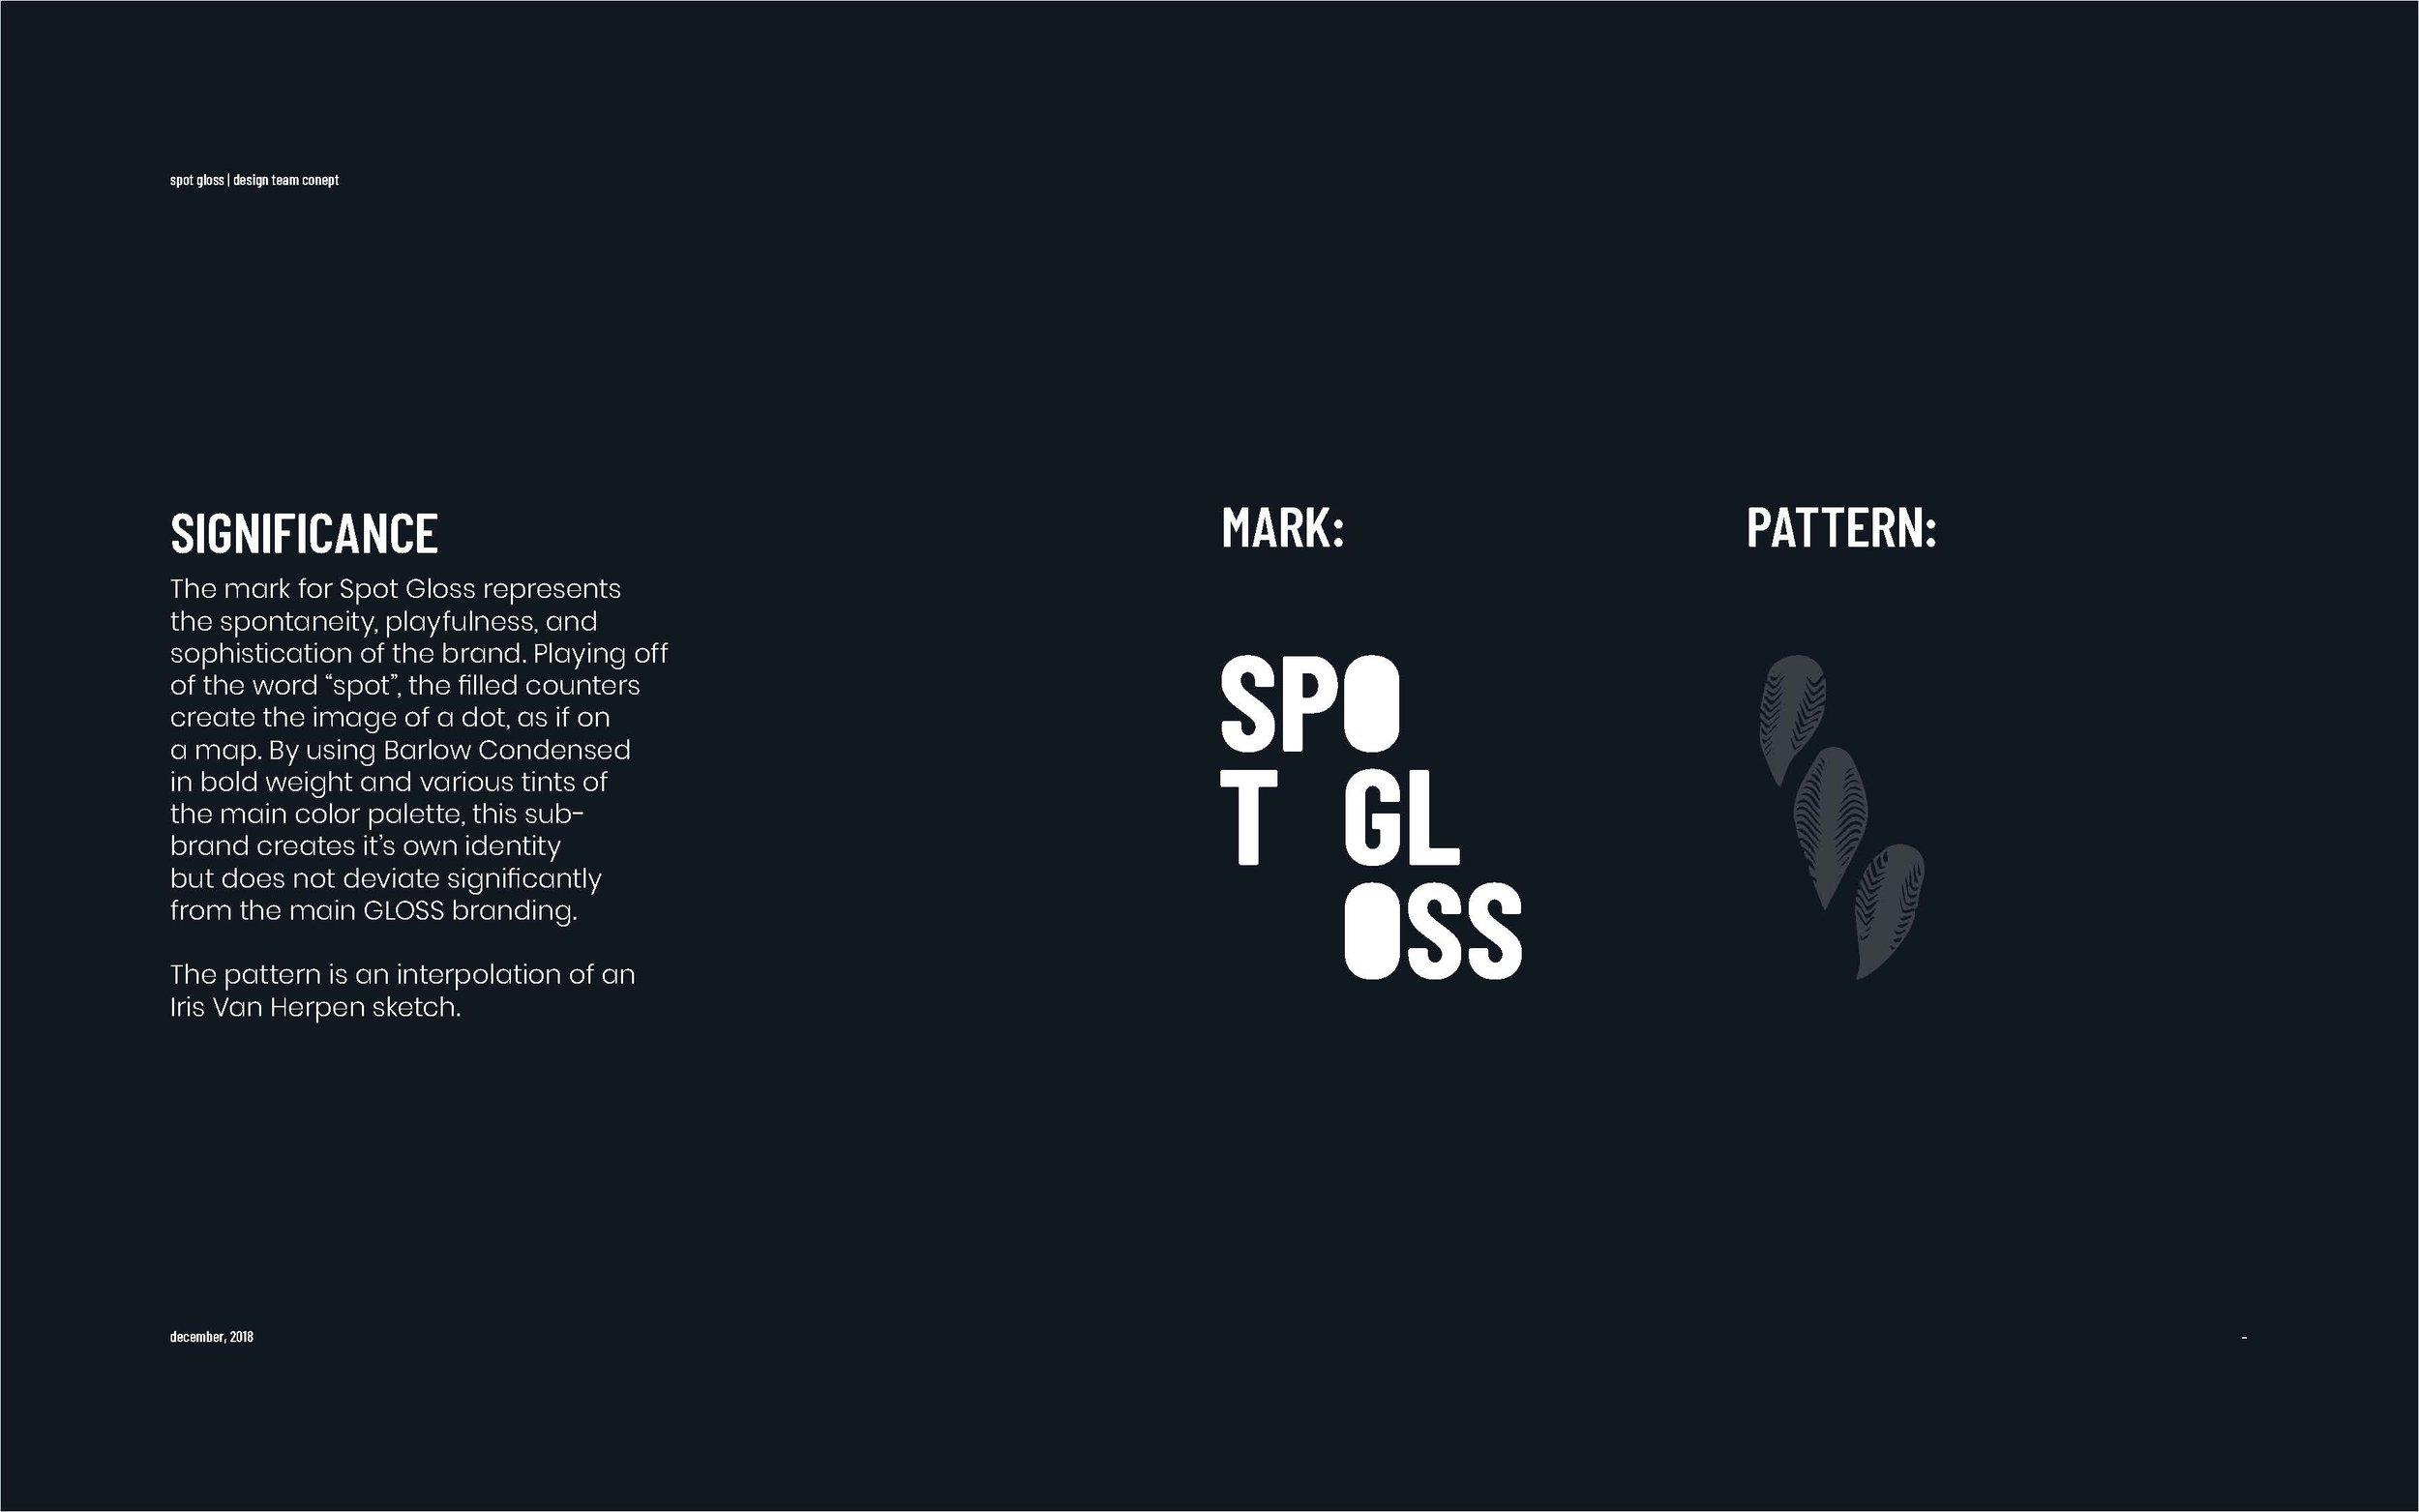 SPOTGLOSS_ConceptPresentation_120518_Page_05.jpg